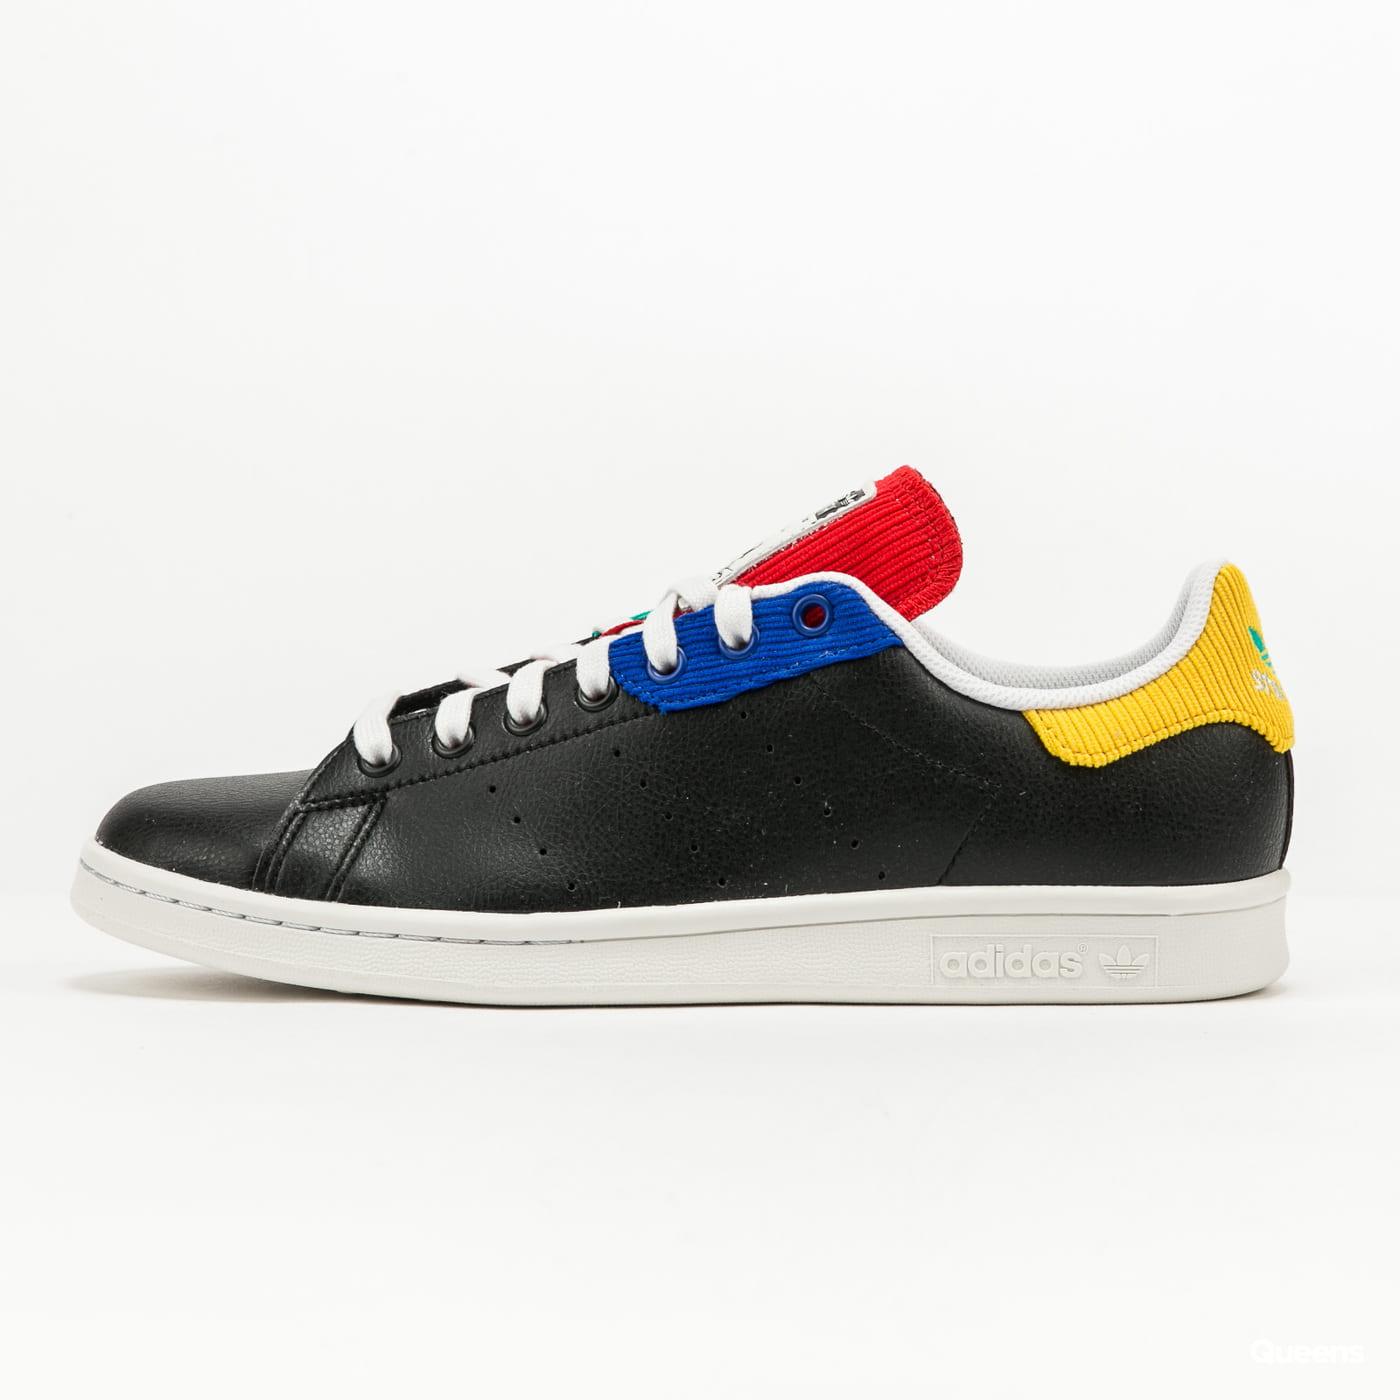 adidas Originals Stan Smith cblack / crywht / royblu